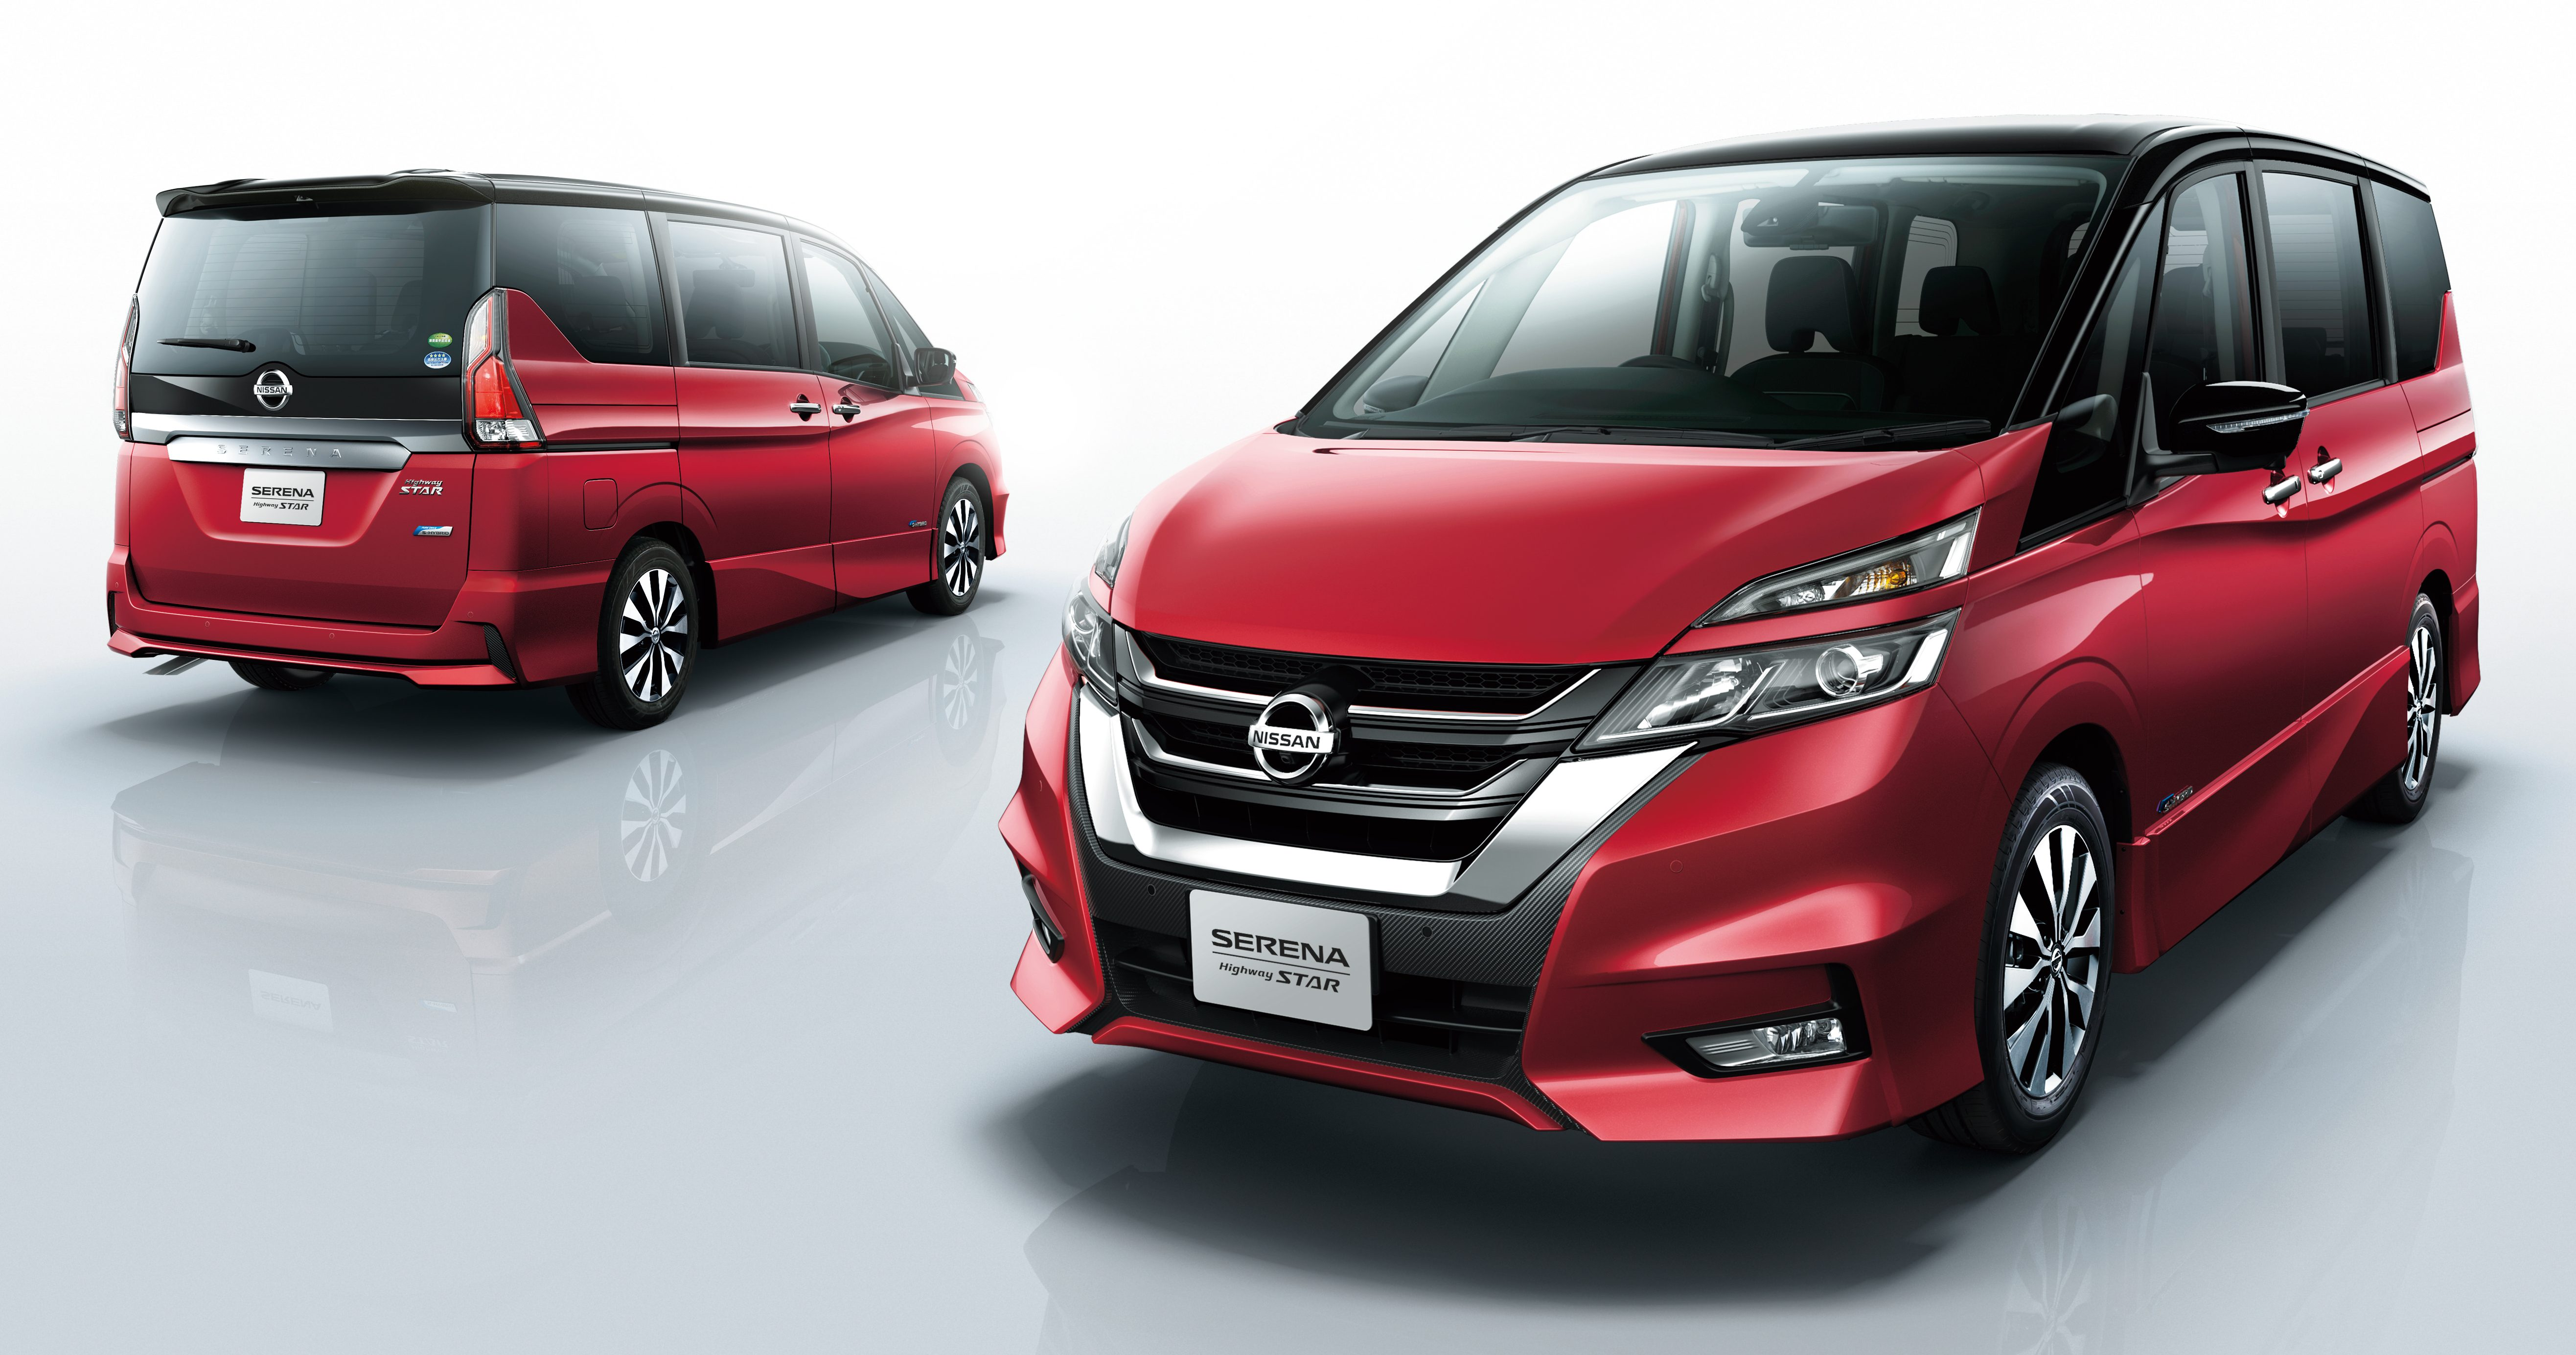 All-new Nissan Serena - fifth-generation model debuts